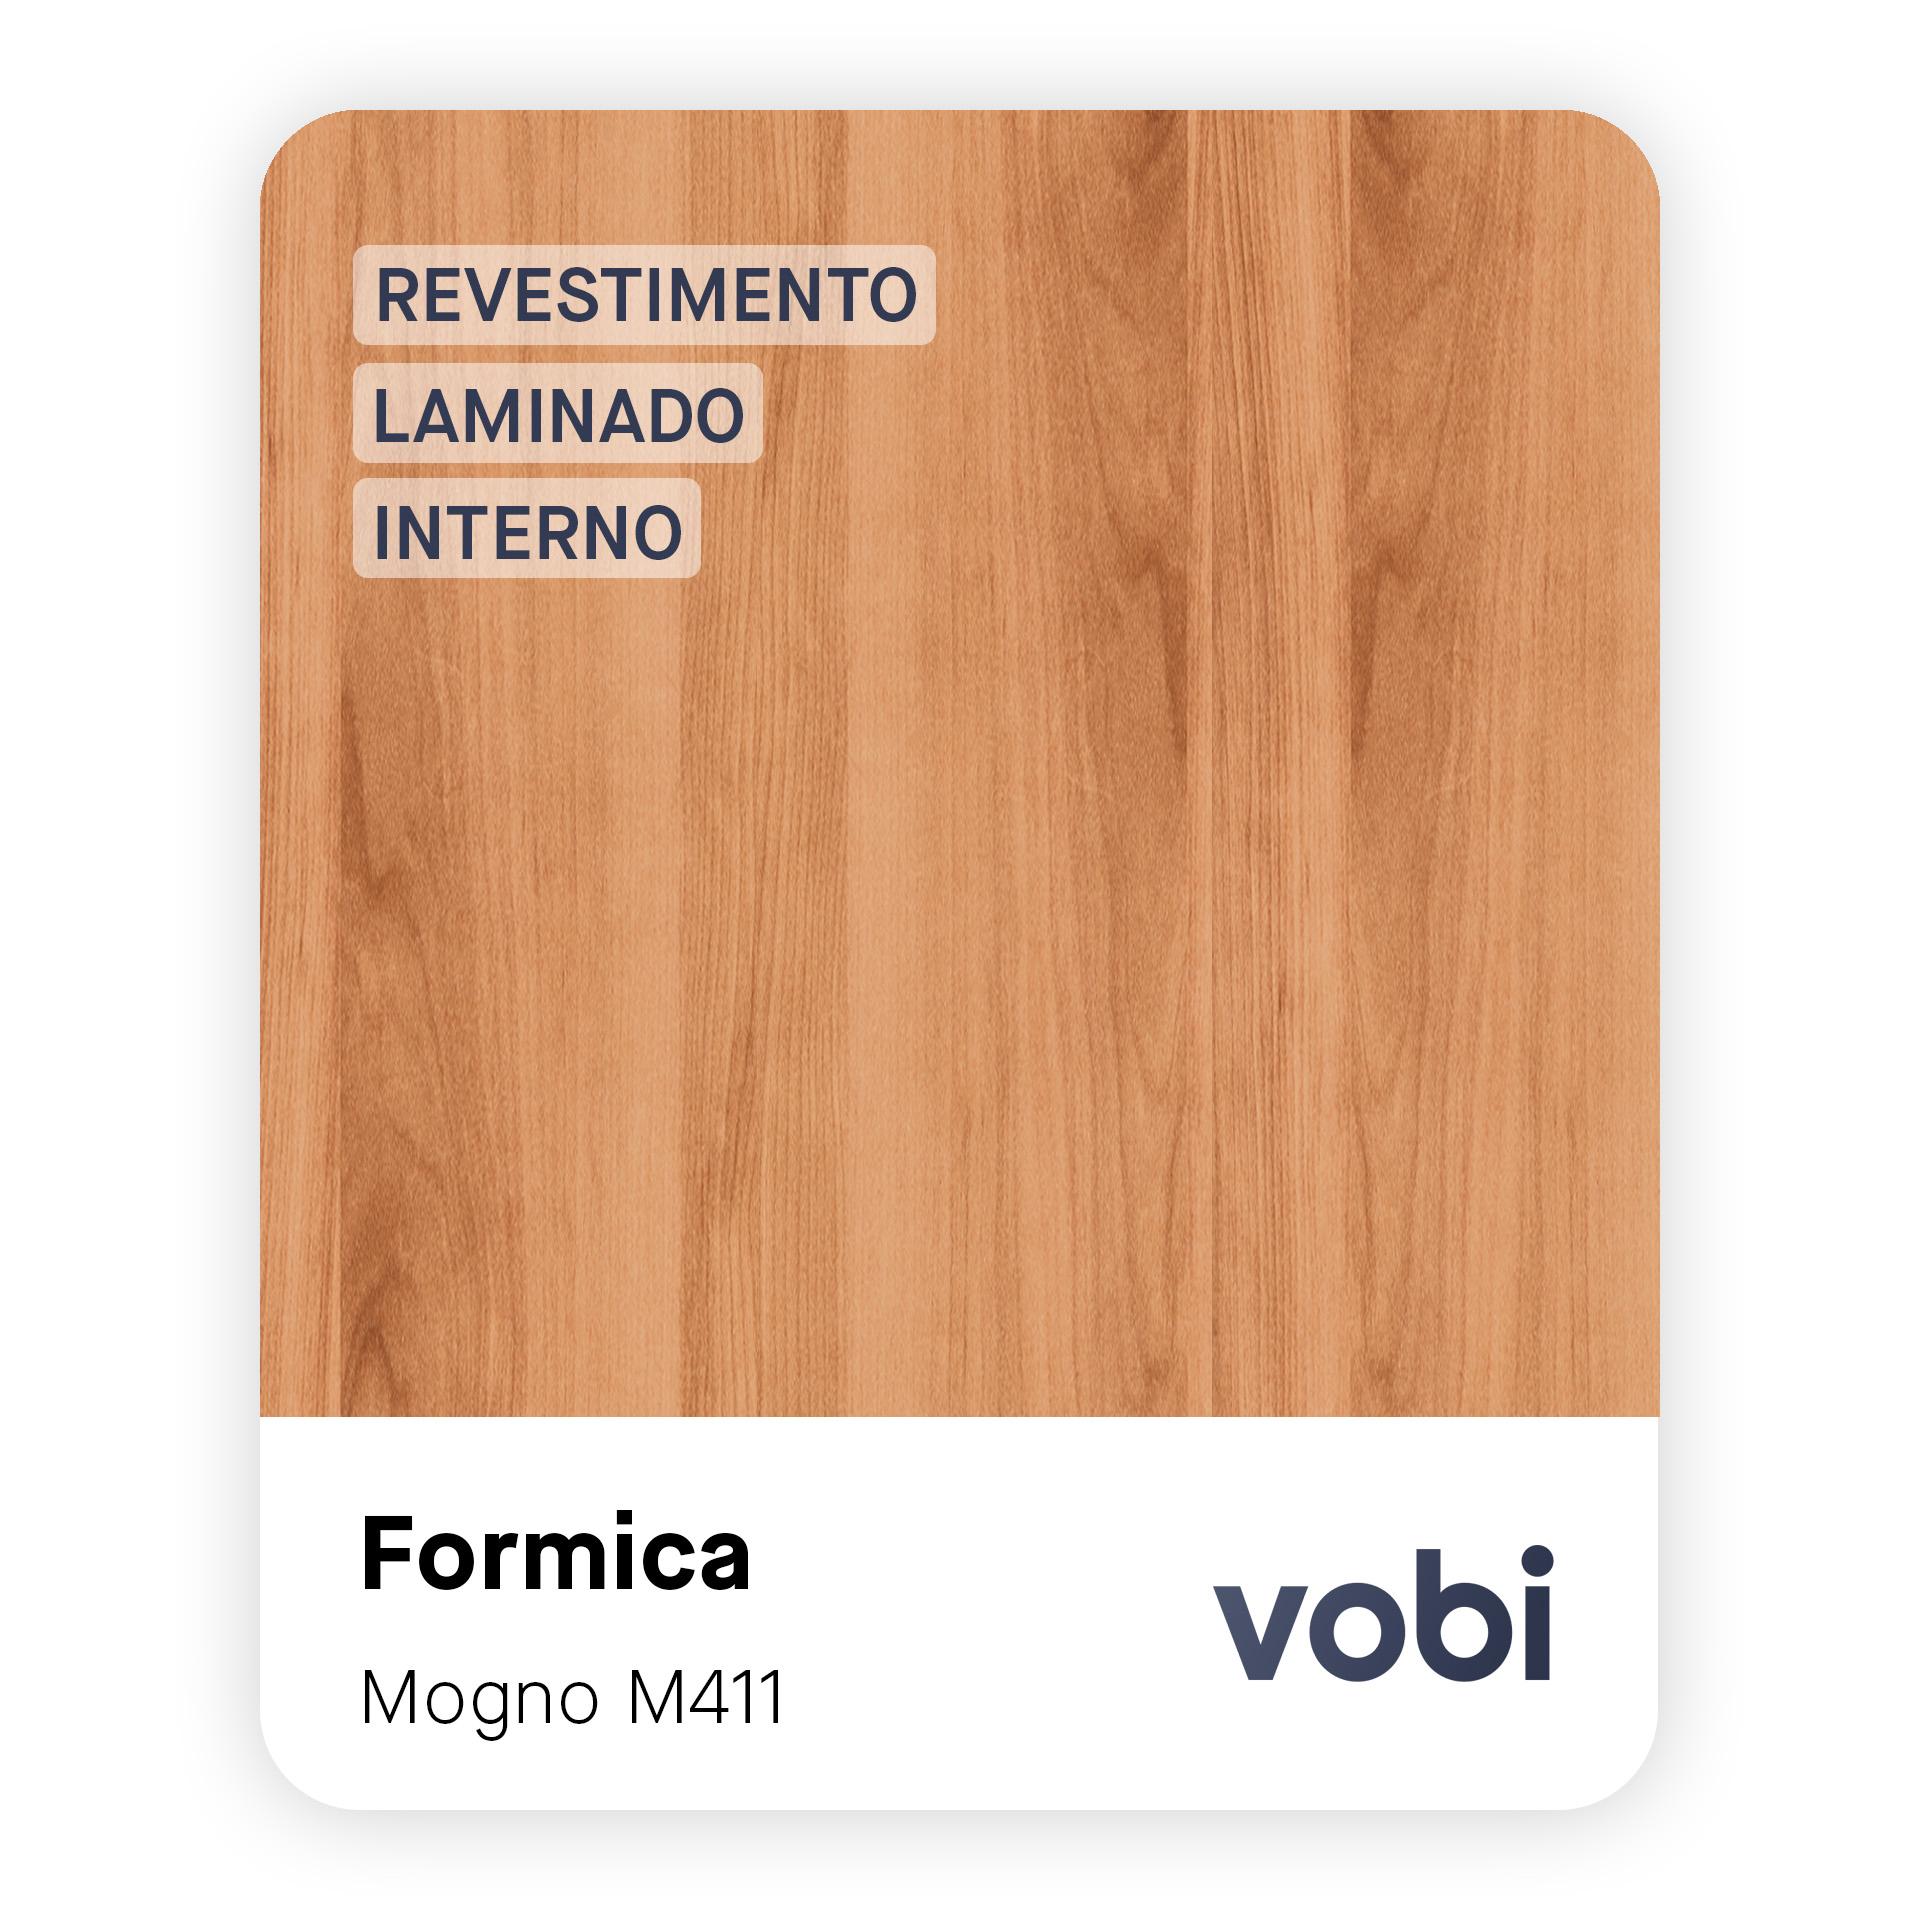 revestimento laminado madeira interno